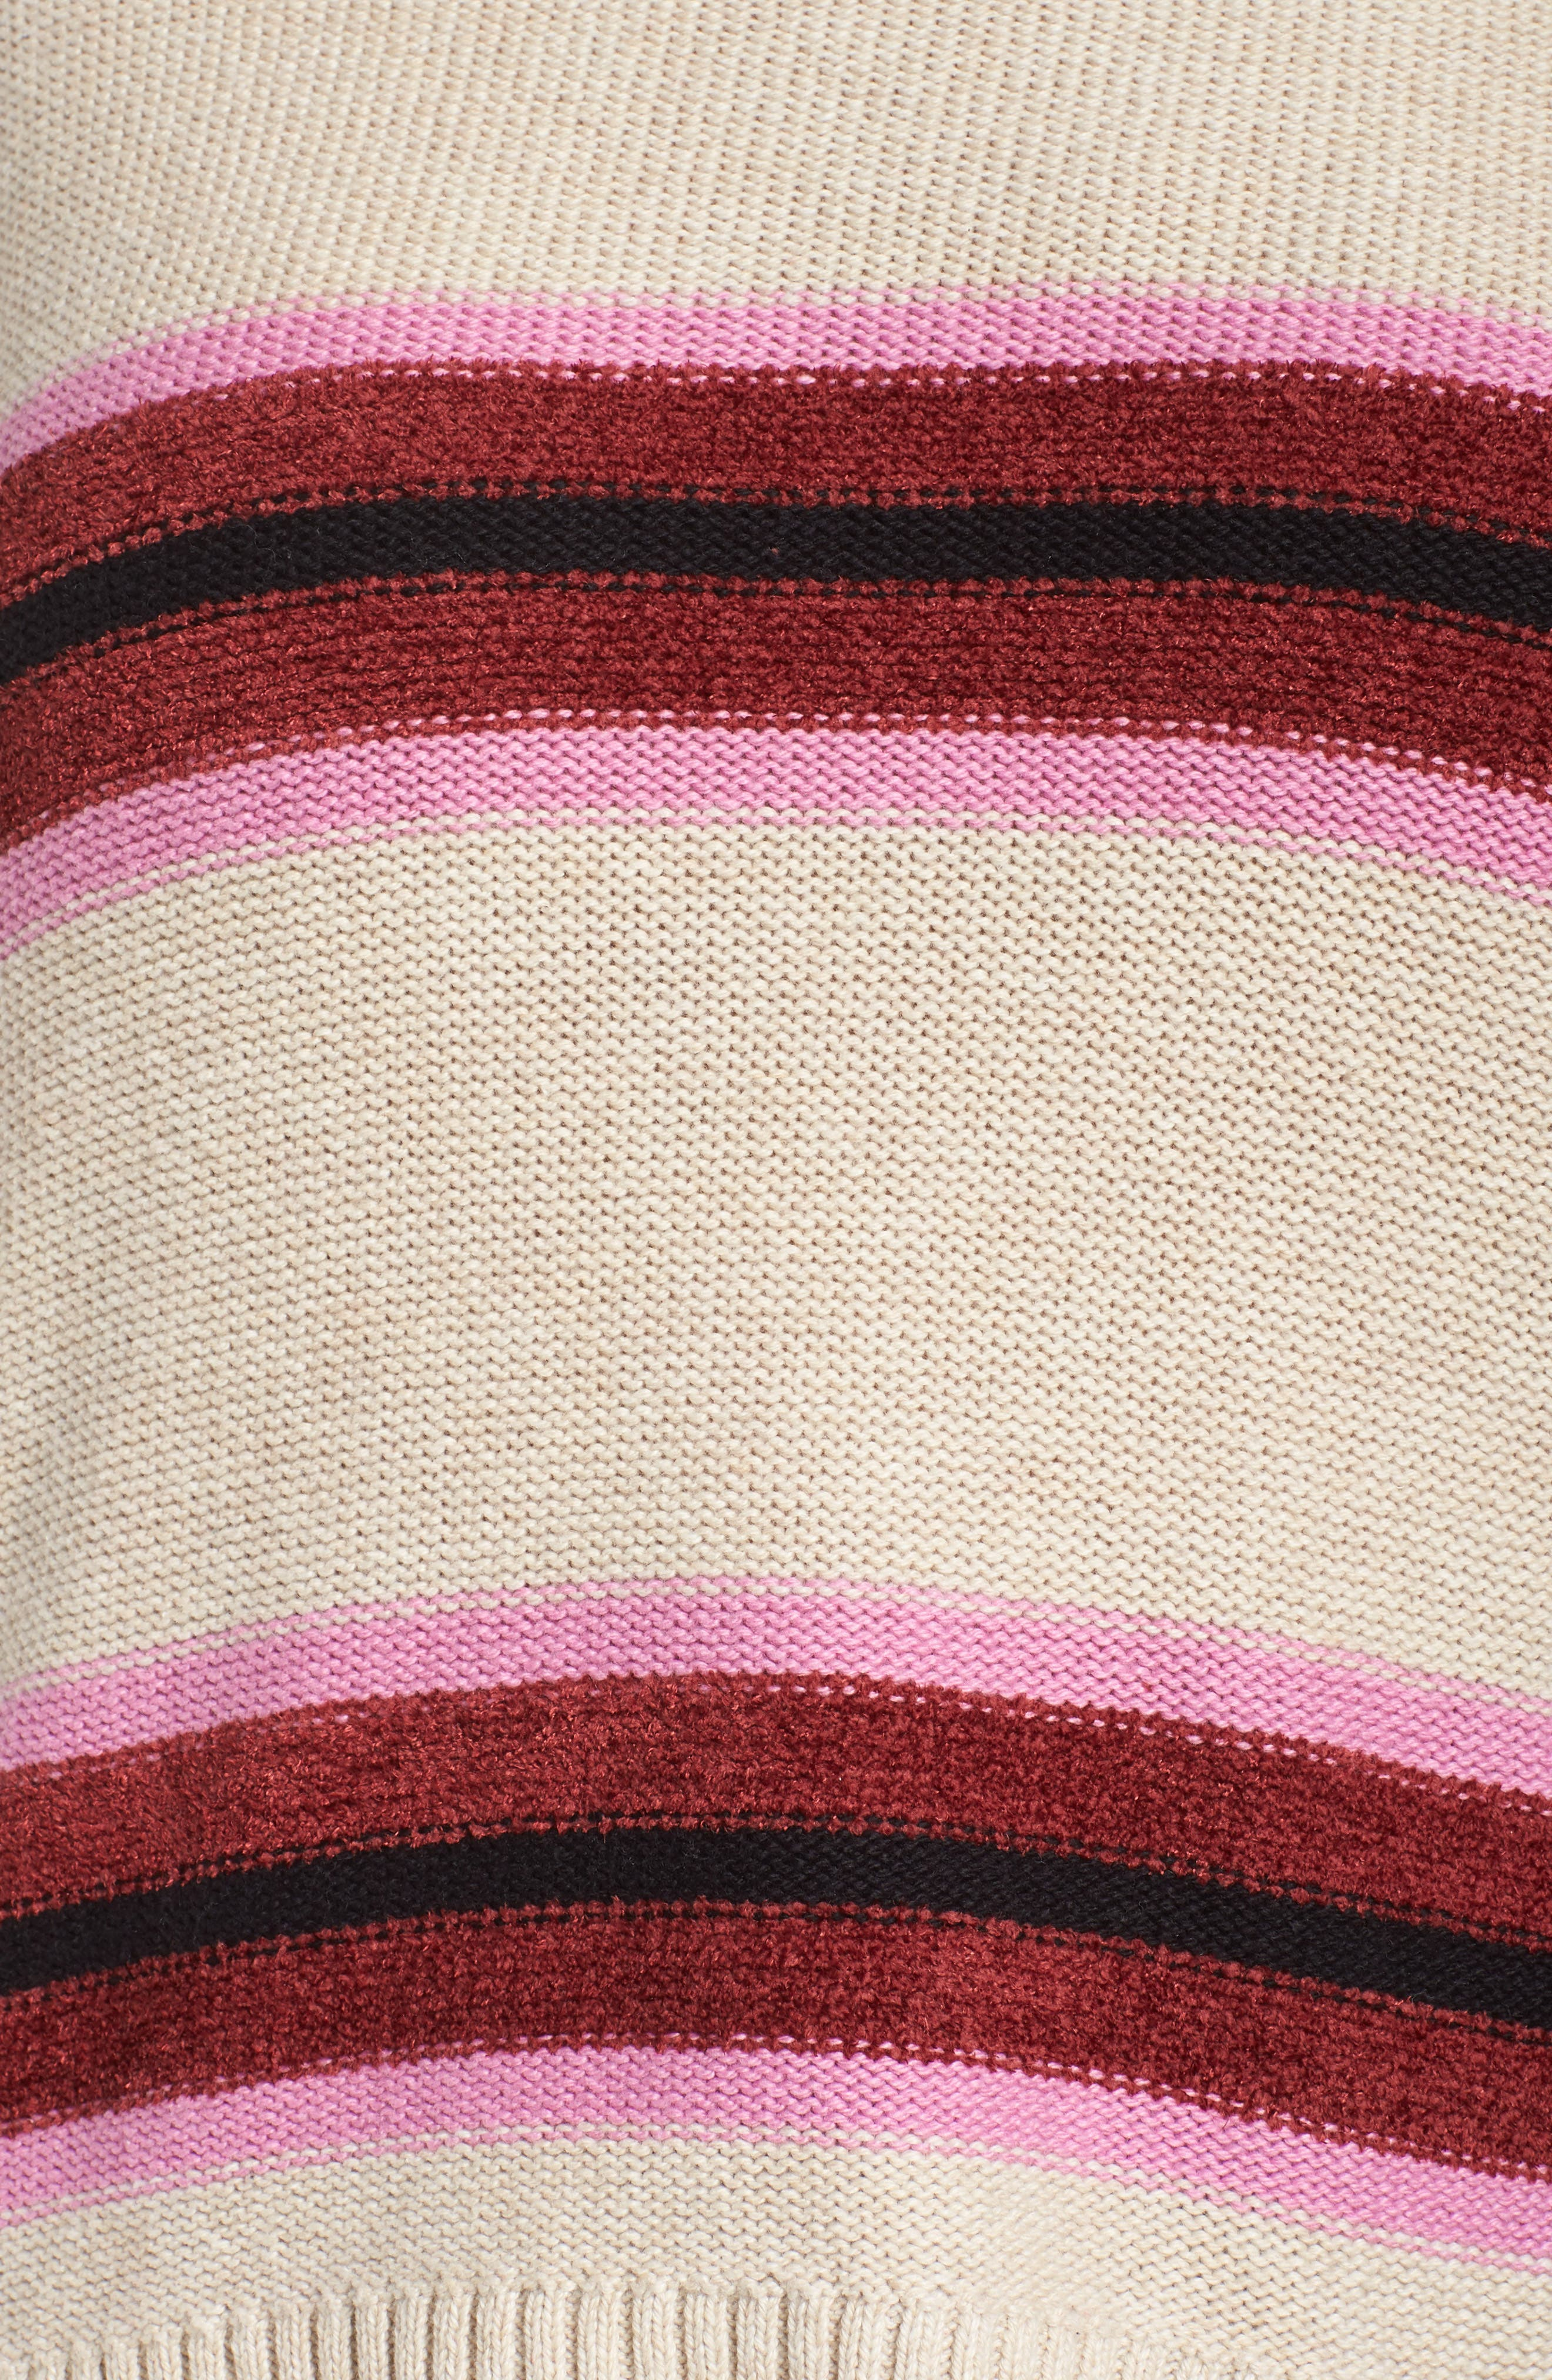 Everyday Stripe Sweater,                             Alternate thumbnail 5, color,                             BEIGE HEATHER ROBYN STRIPE